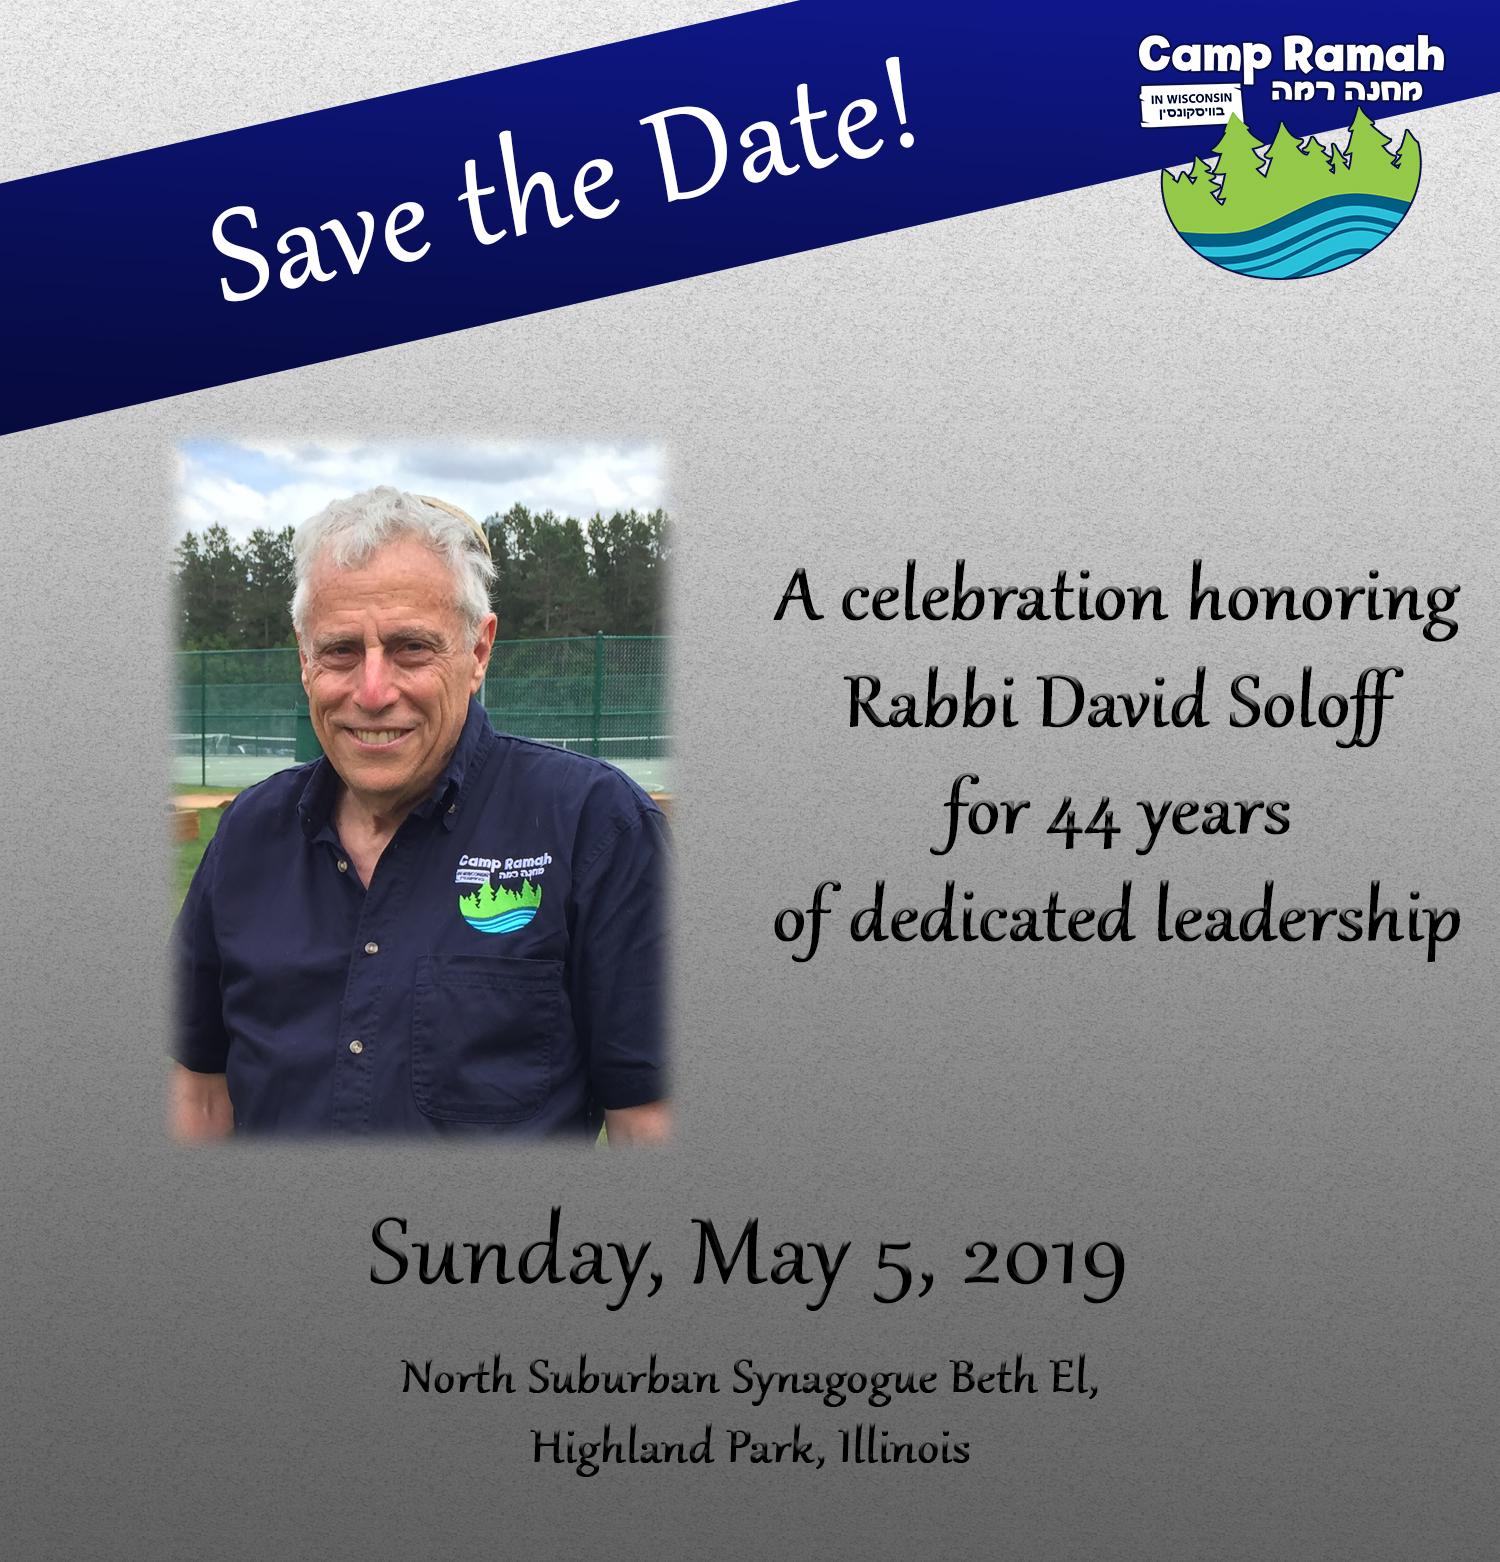 rabbi soloff event save the date.jpg